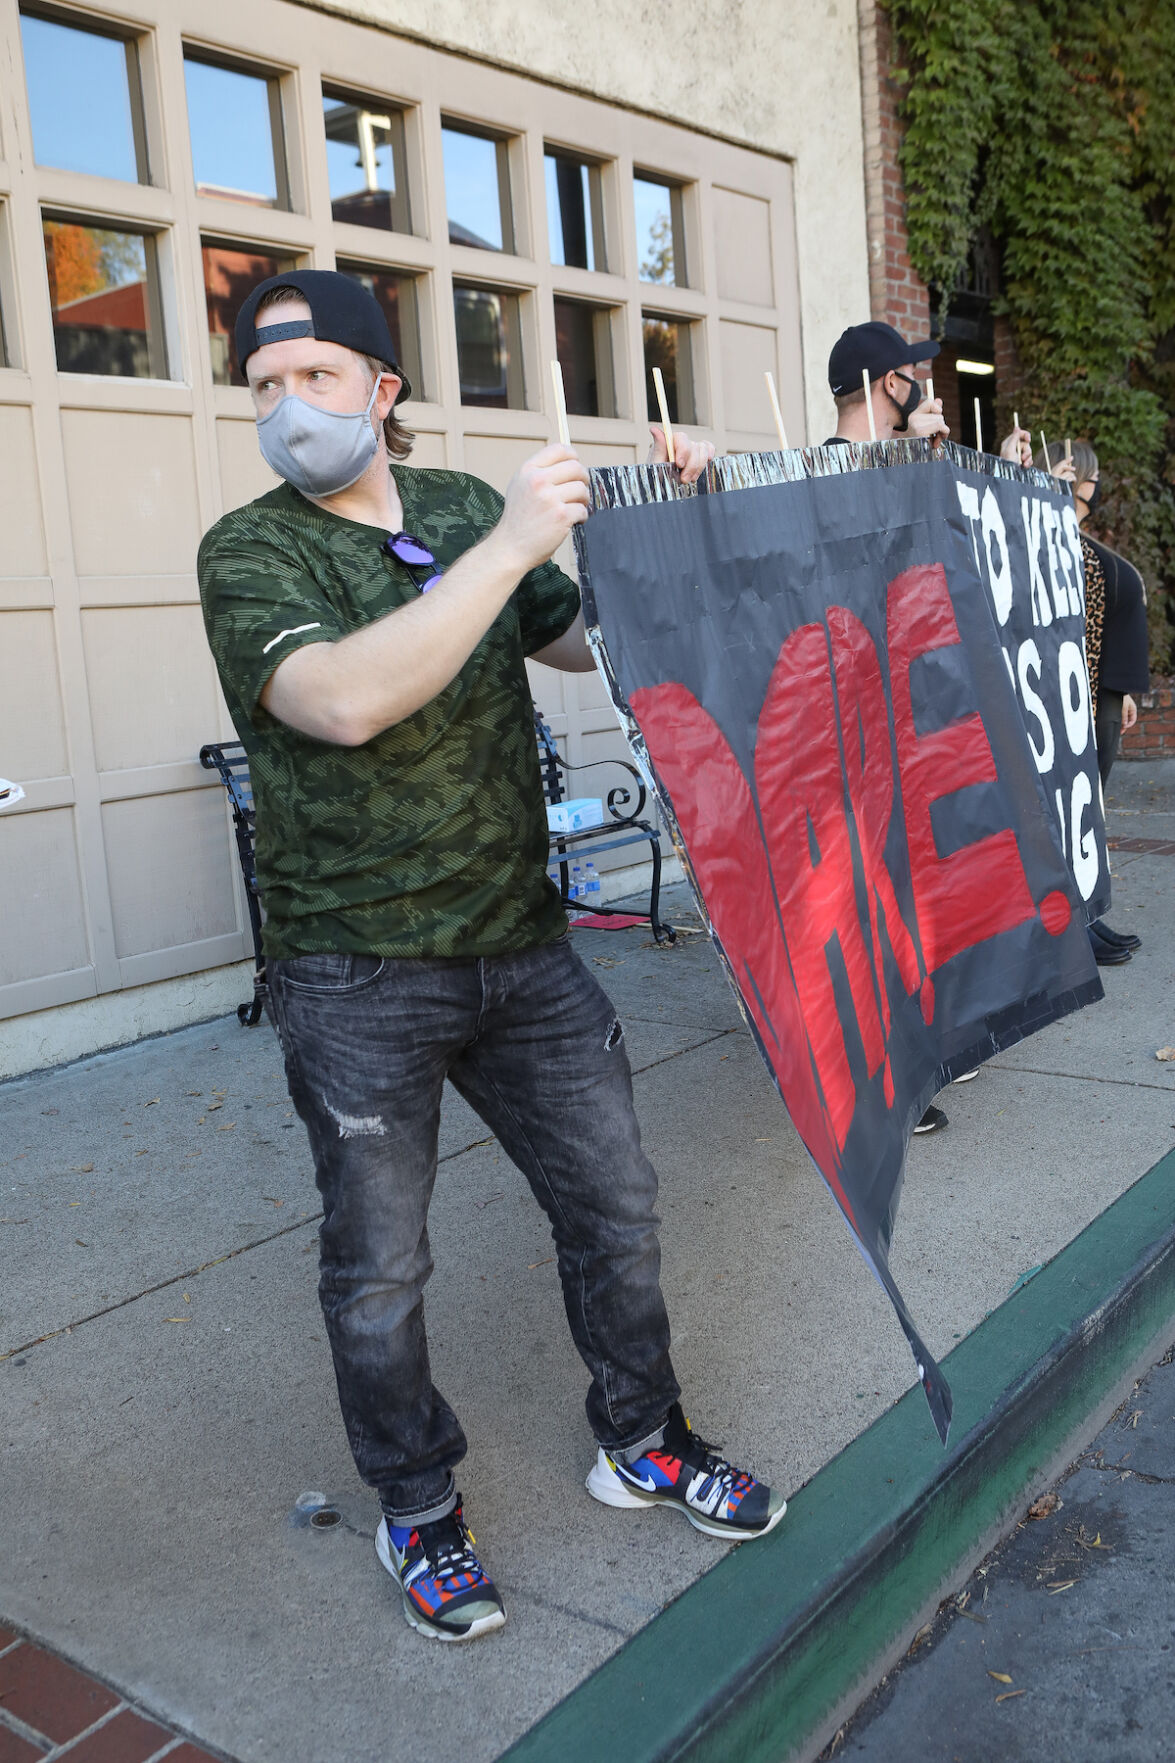 Marijuana protestors